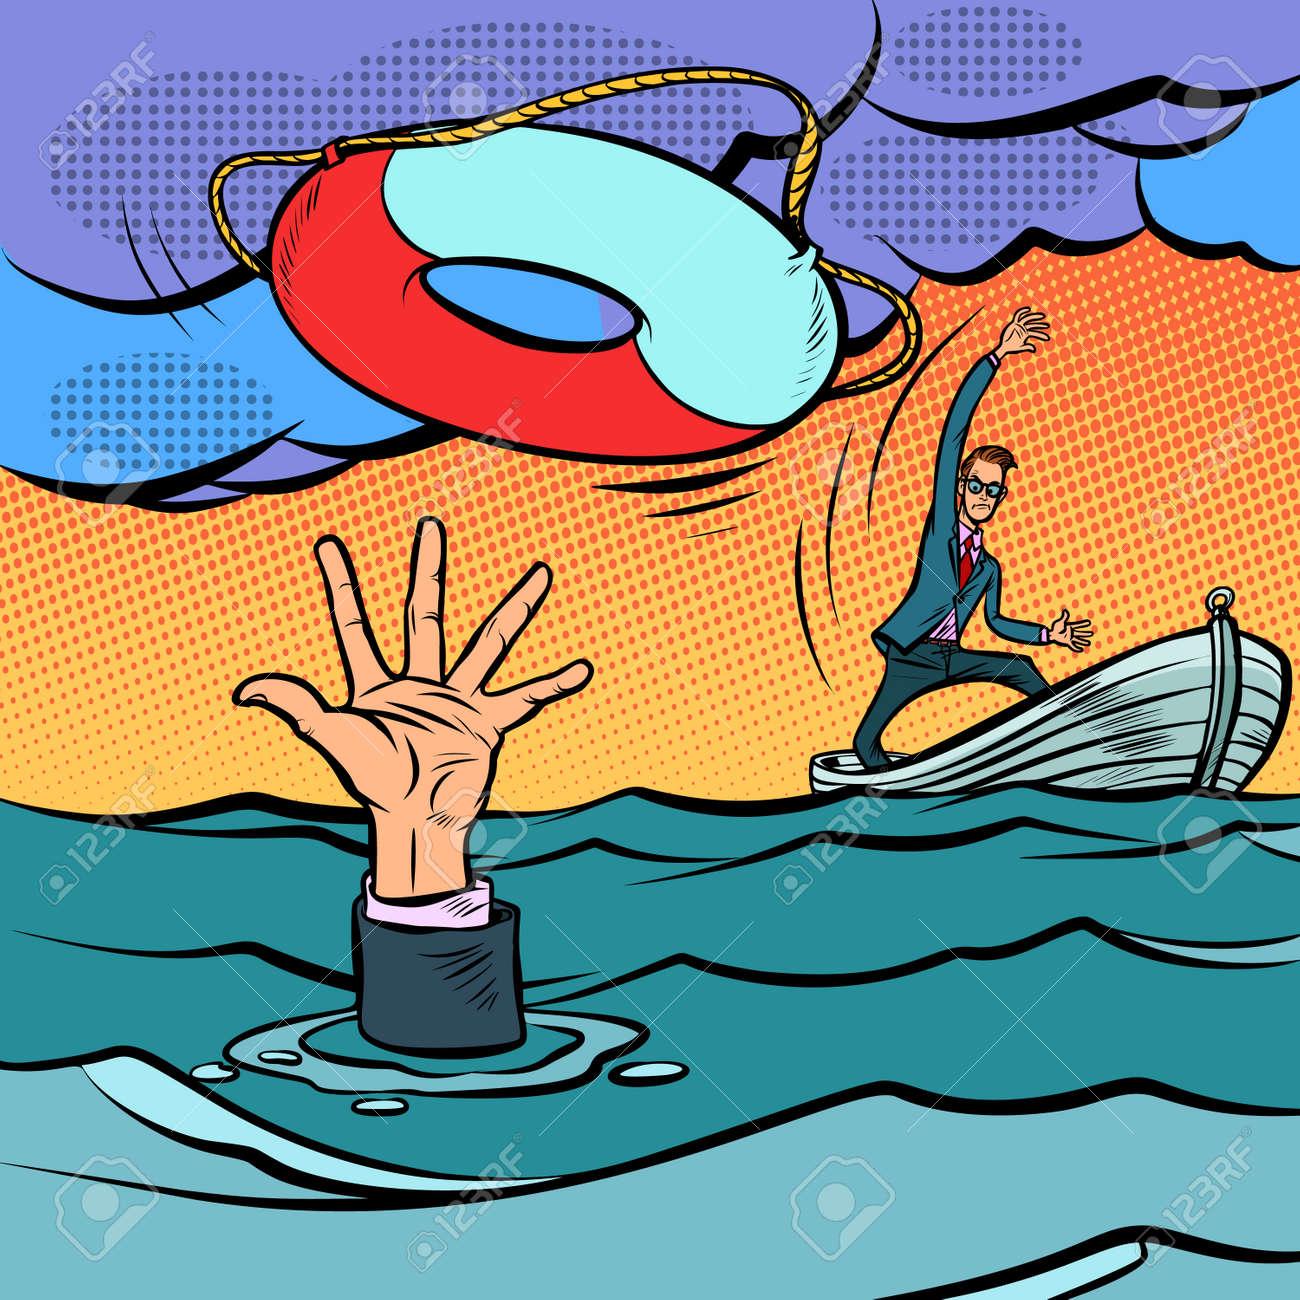 businessman and lifeline. saving the business. life insurance. Comic cartoon pop art retro vector illustration hand drawing - 125832277